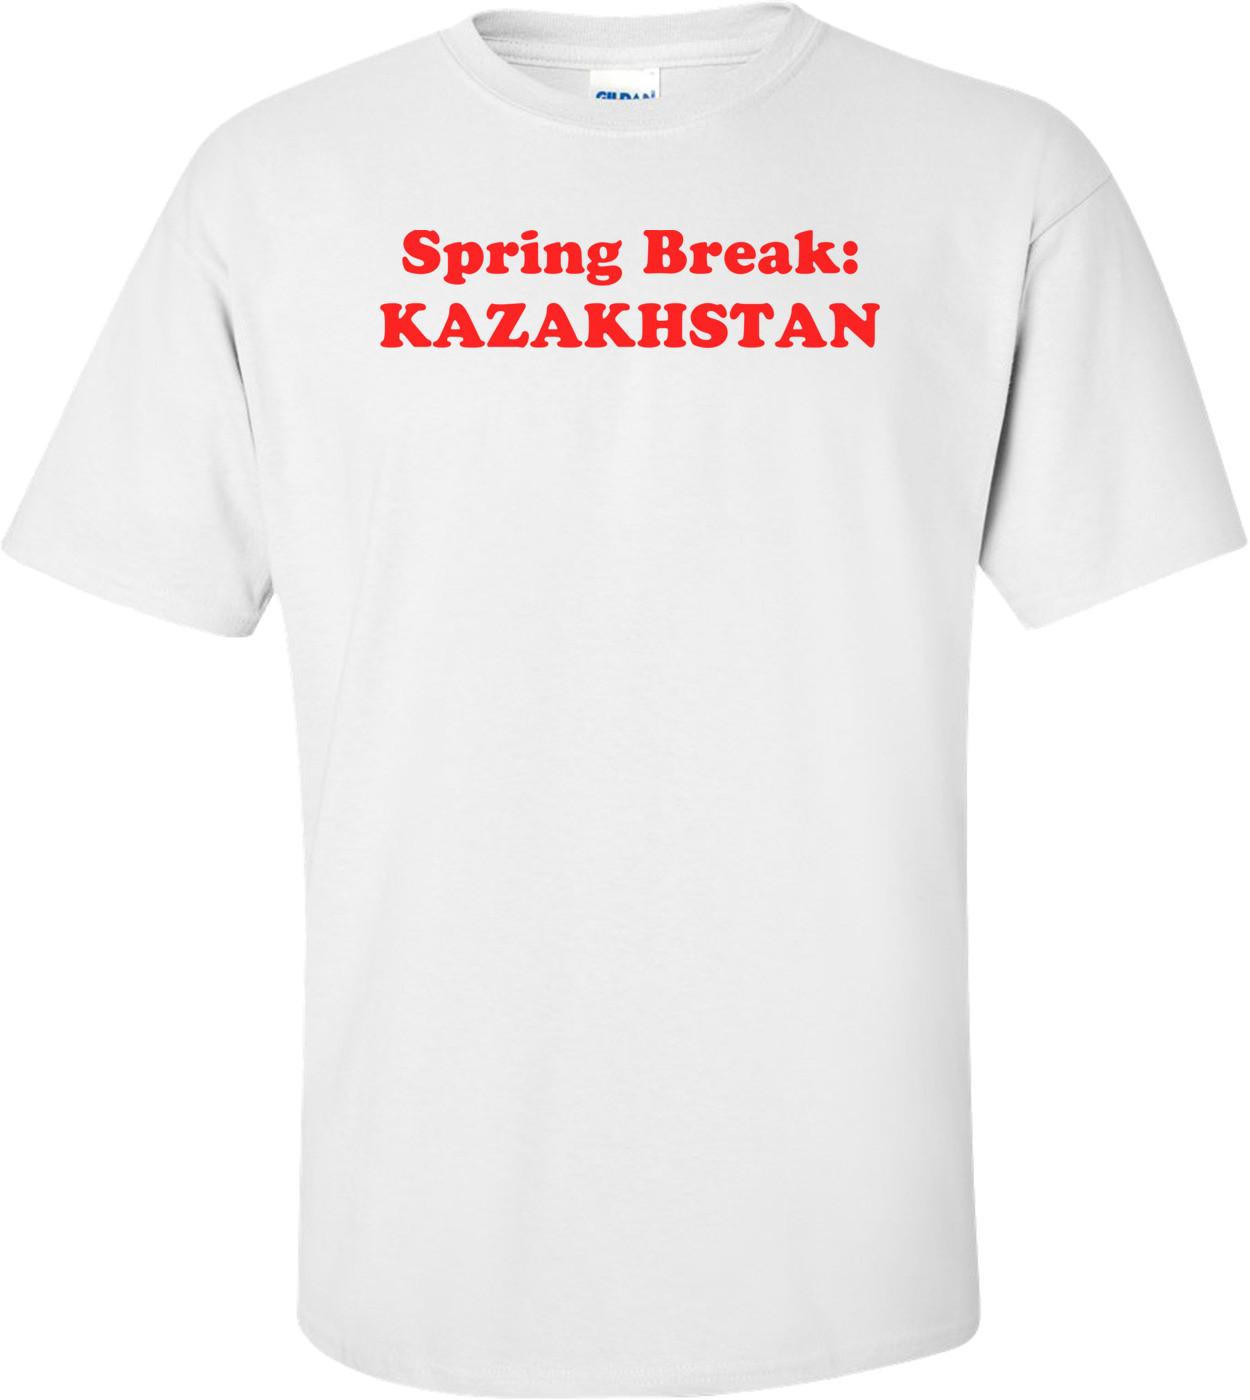 Spring Break: KAZAKHSTAN Shirt